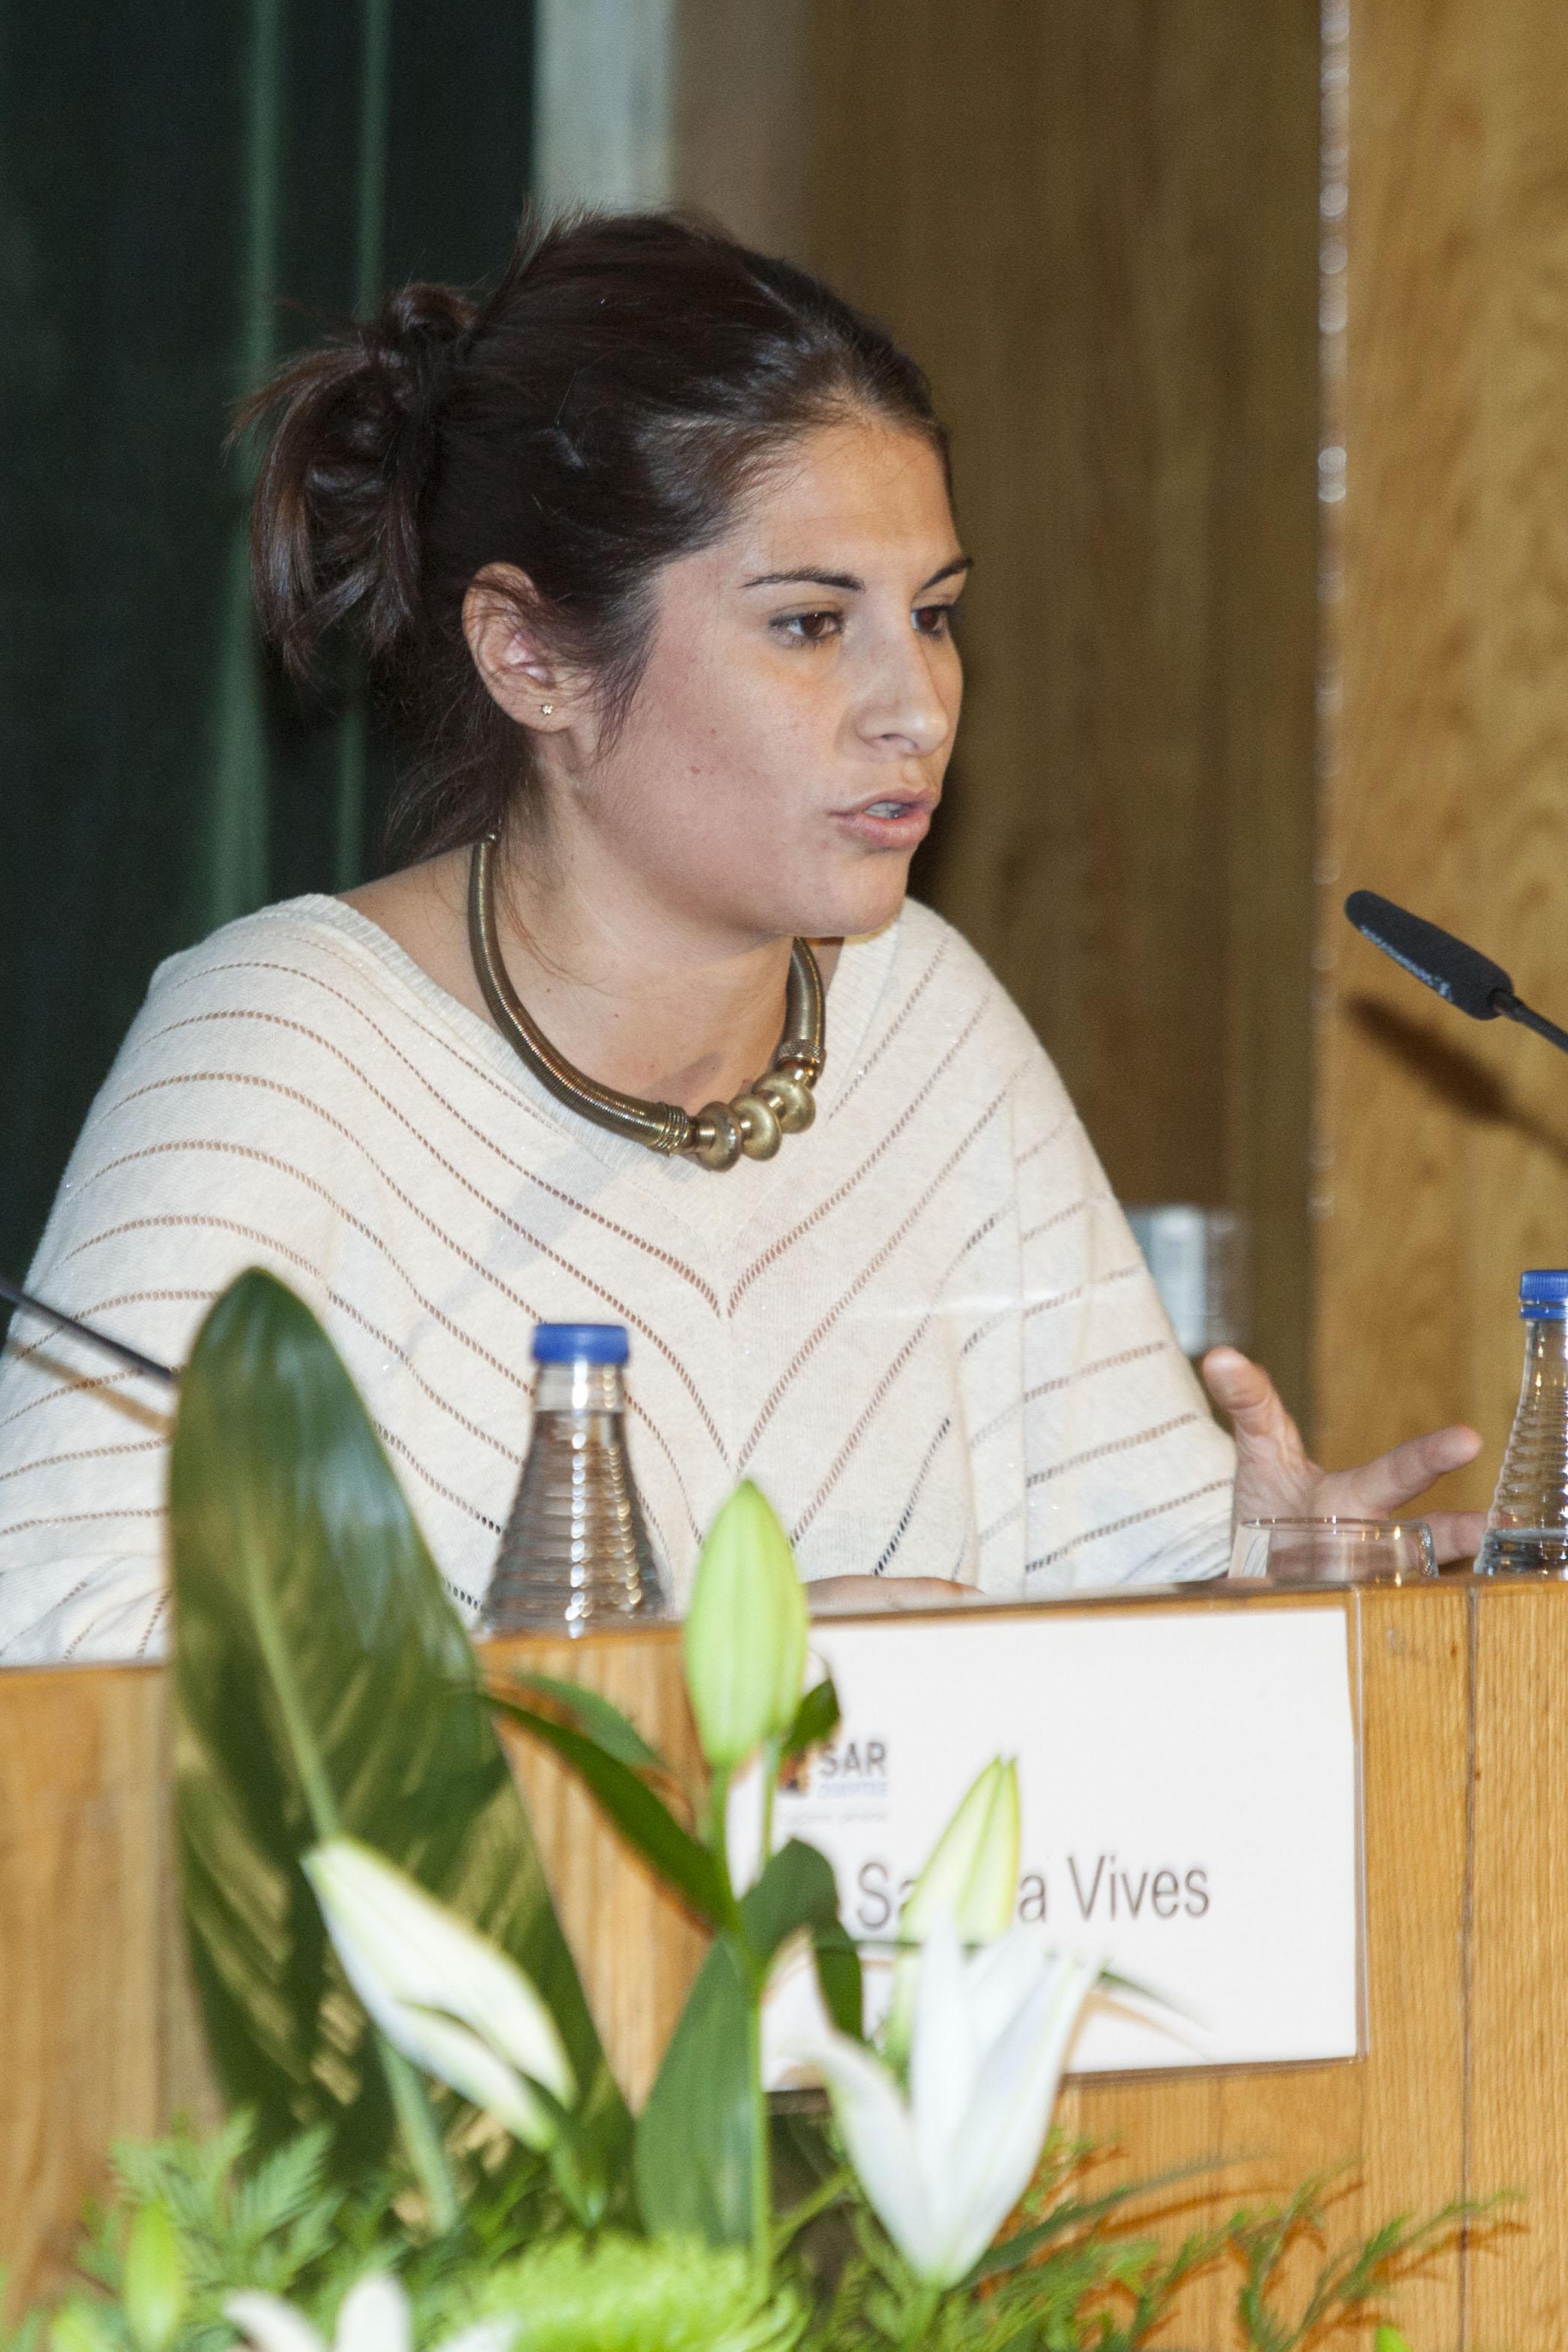 14-10-2014 Jornada SarQuavitae Palma de Mallorca 14